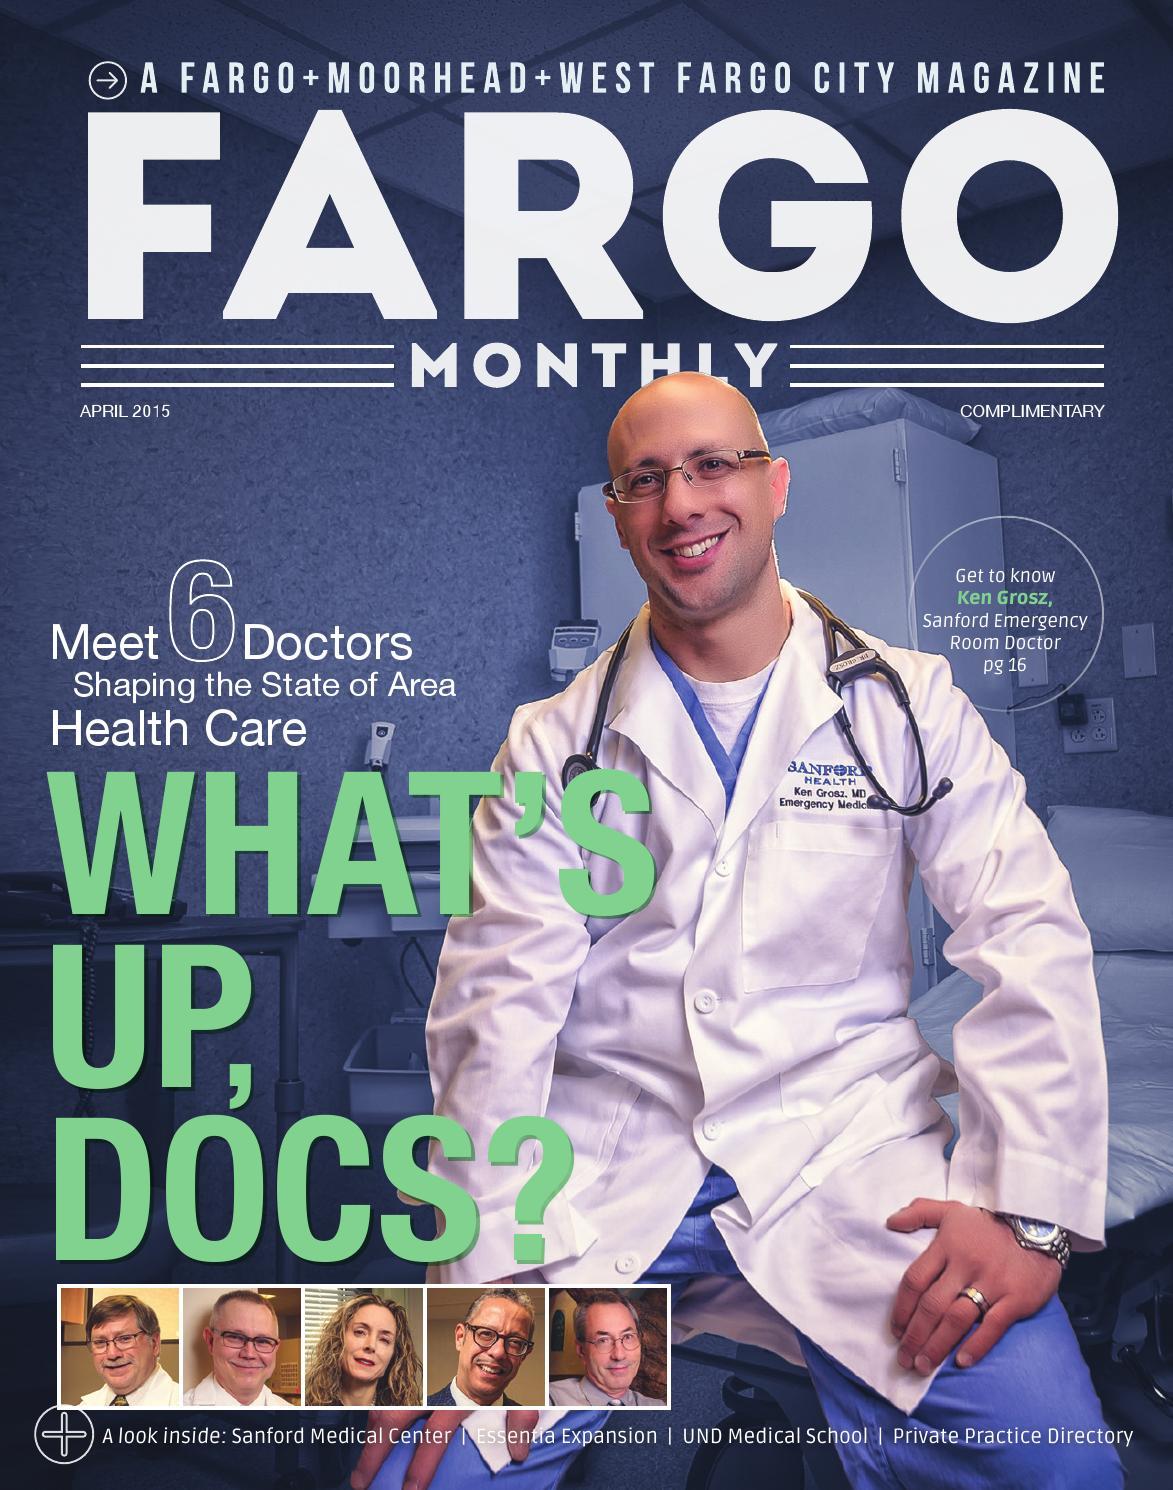 Sanford Fargo Emergency Room Doctors